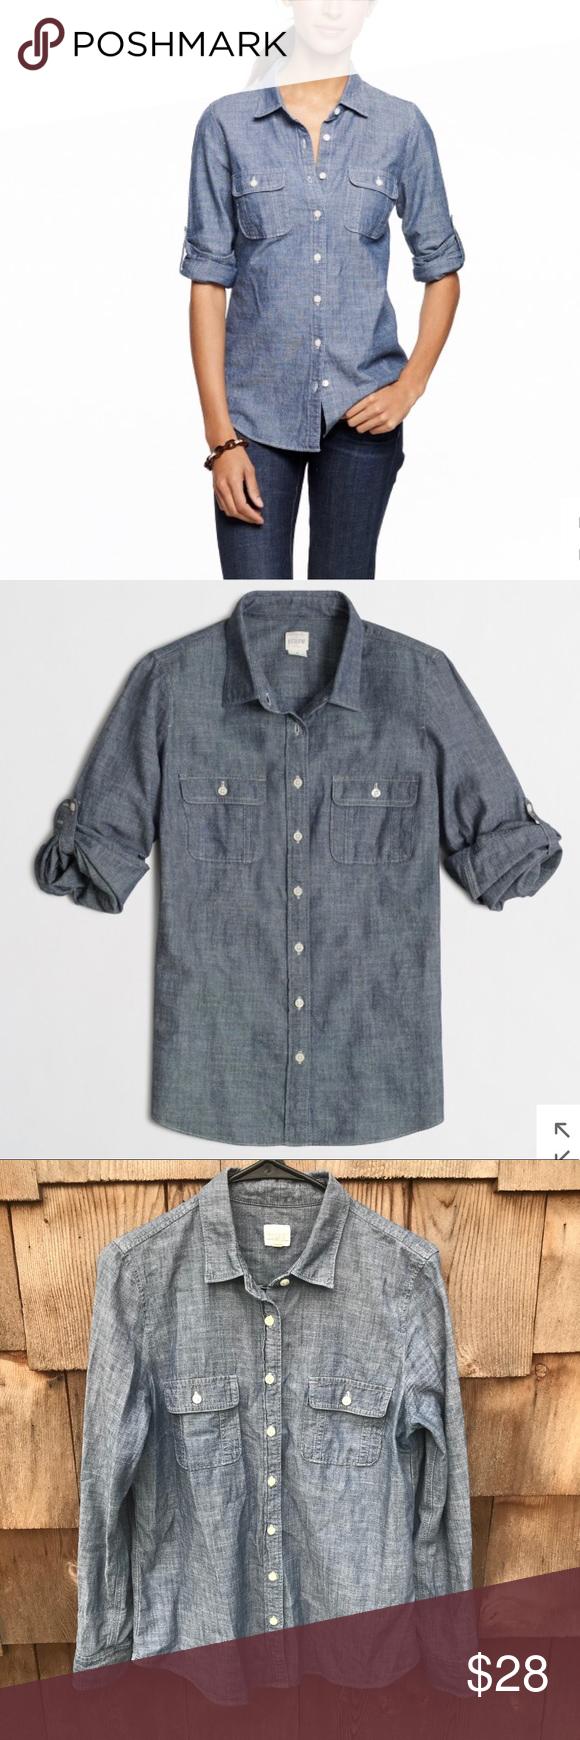 Sold JCrew Two Pocket Chambray Shirt Button Down